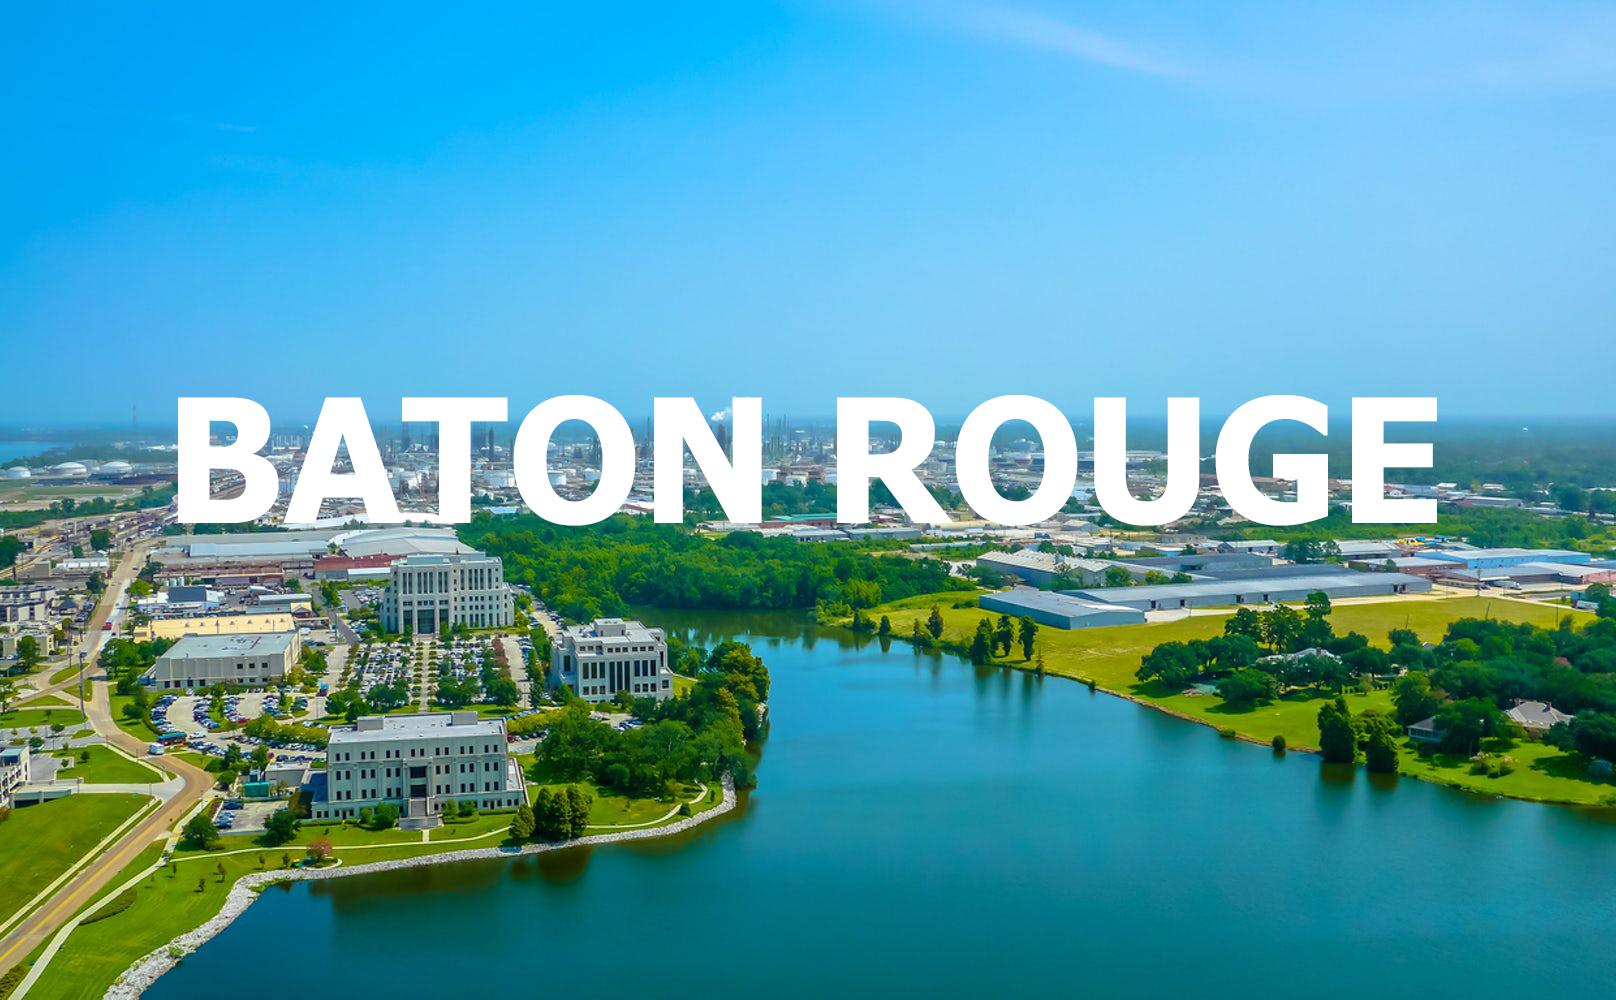 Baton-Roouge pic.jpg